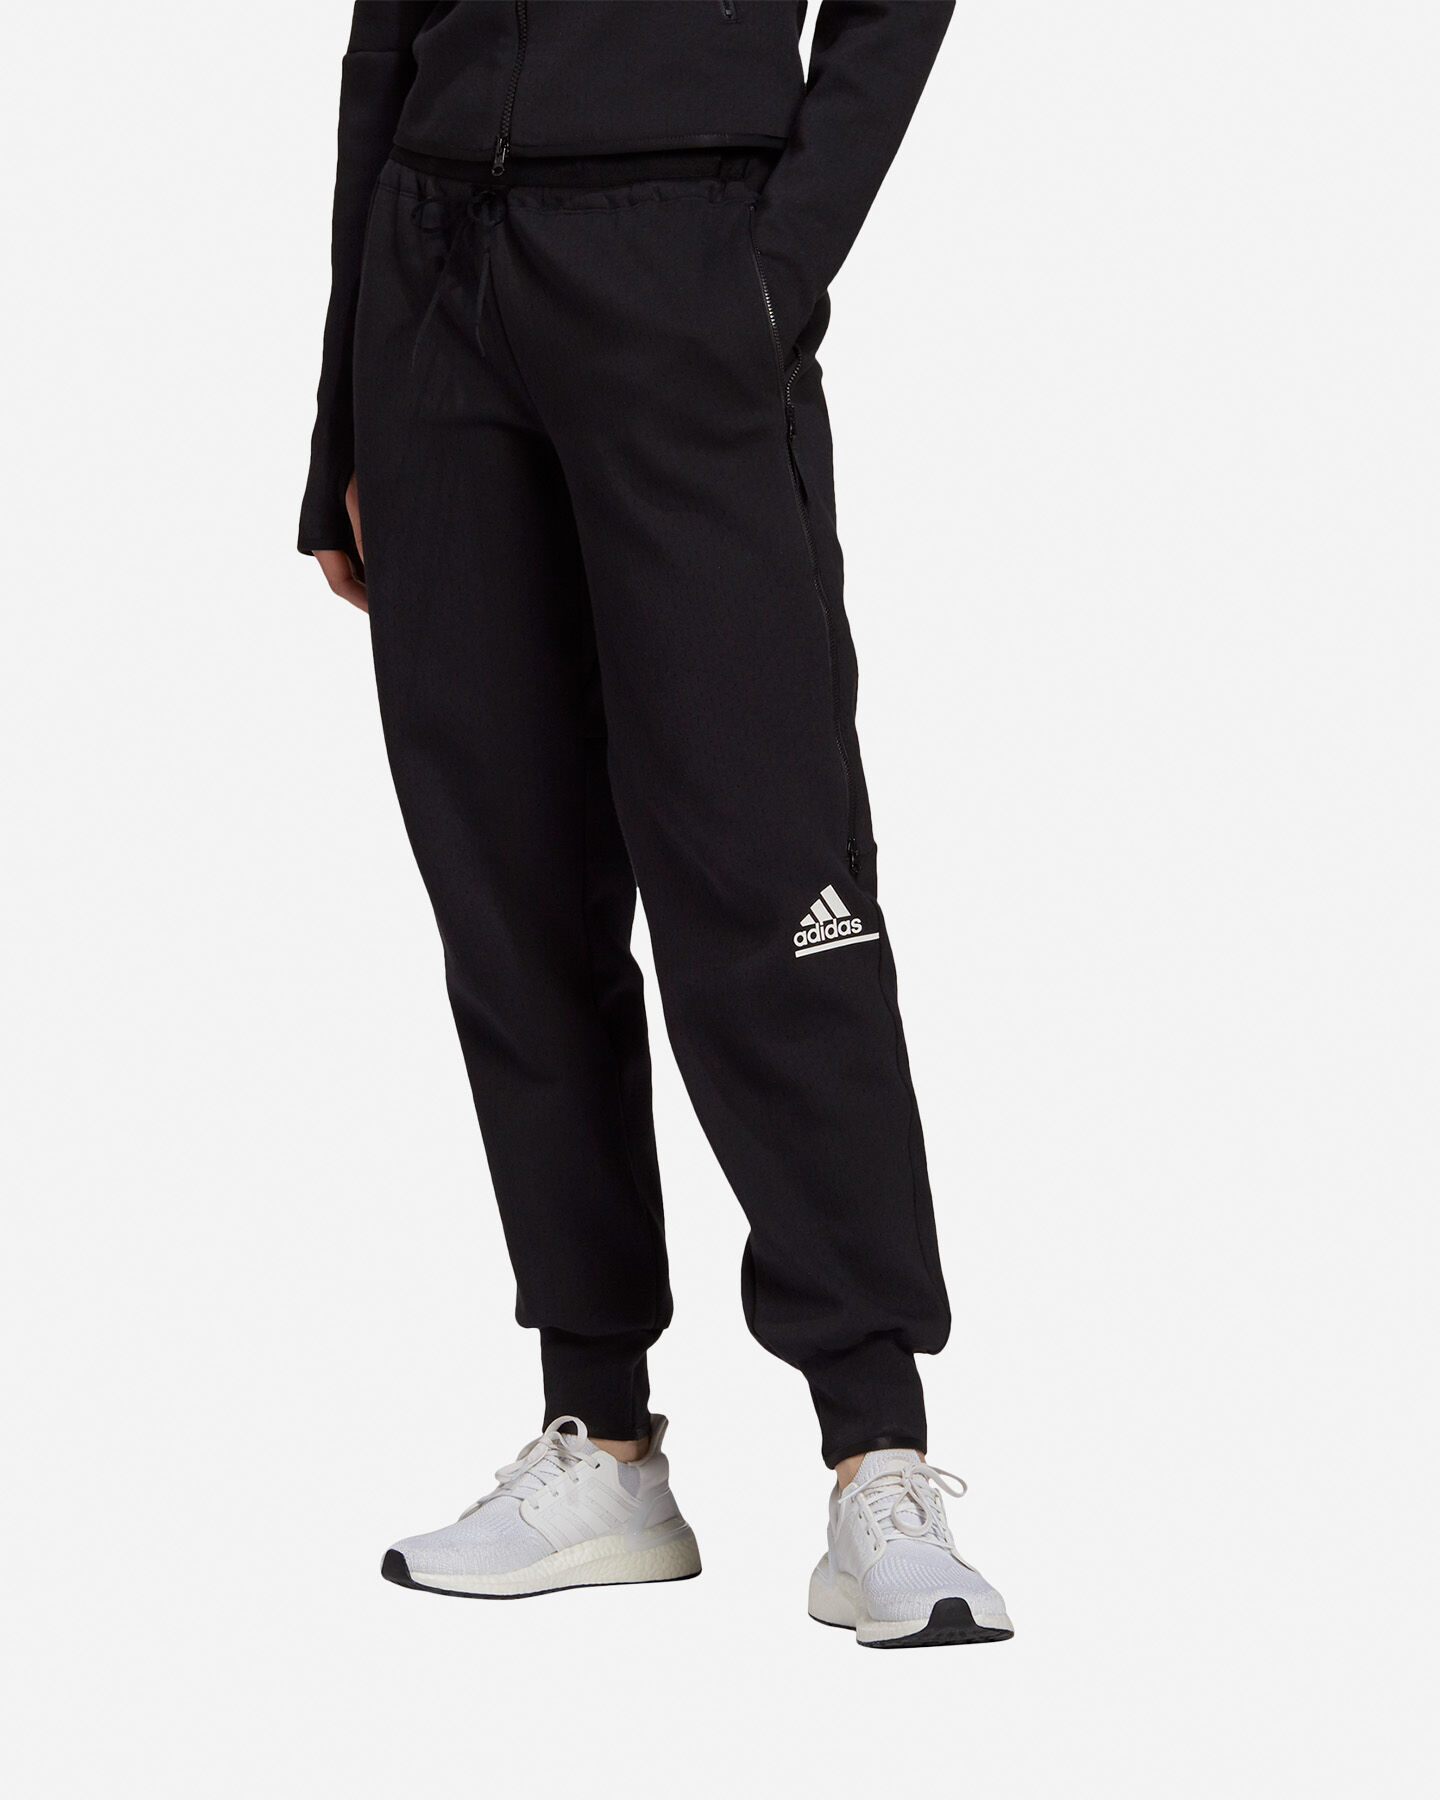 Pantalone ADIDAS ZONE  W S5228086 scatto 2